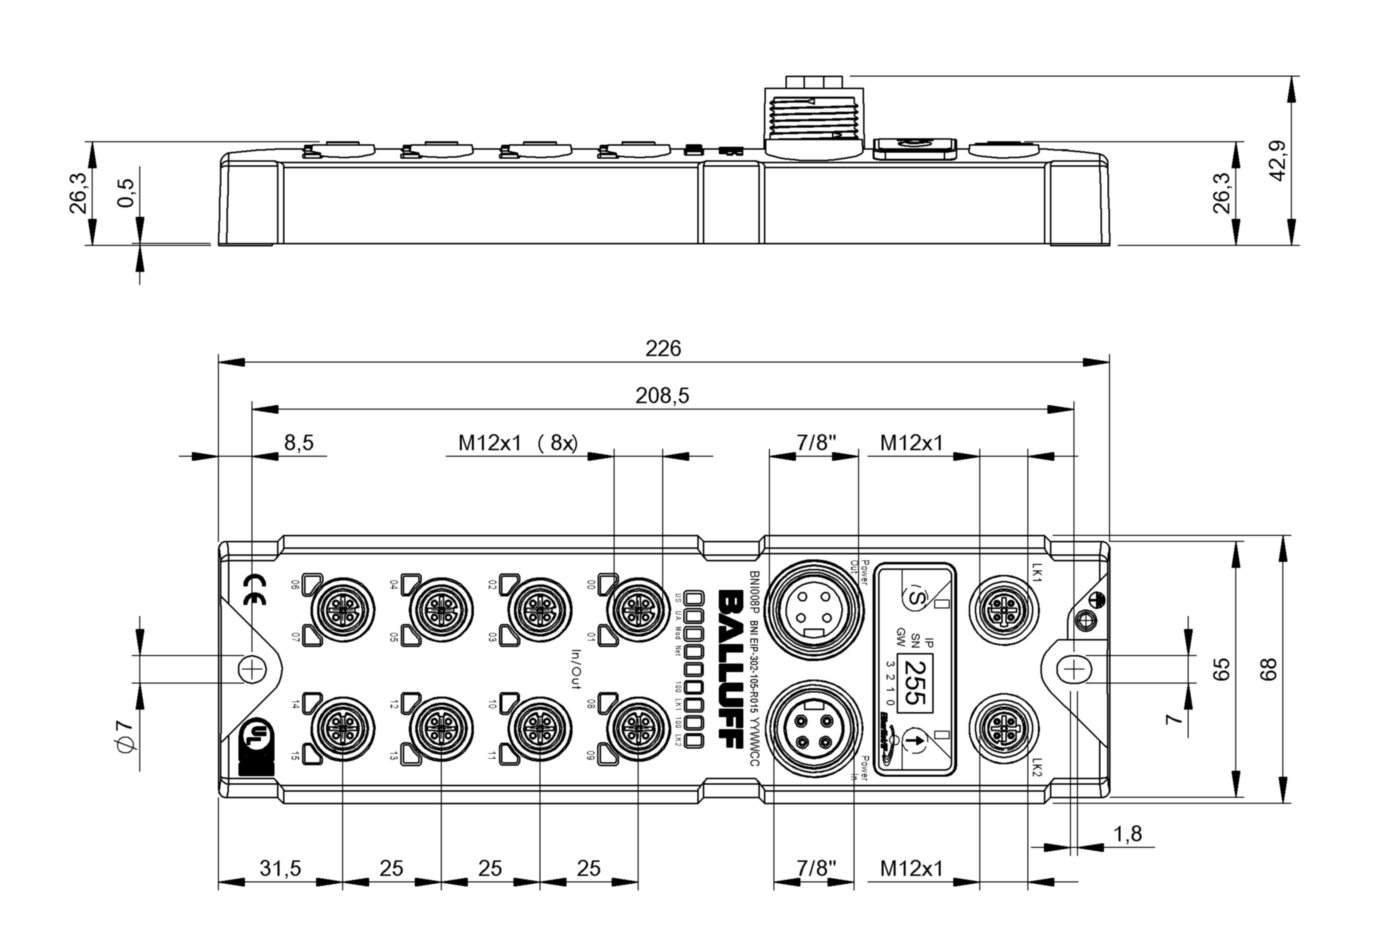 Balluff Wiring Diagram - Wiring Diagrams Load on